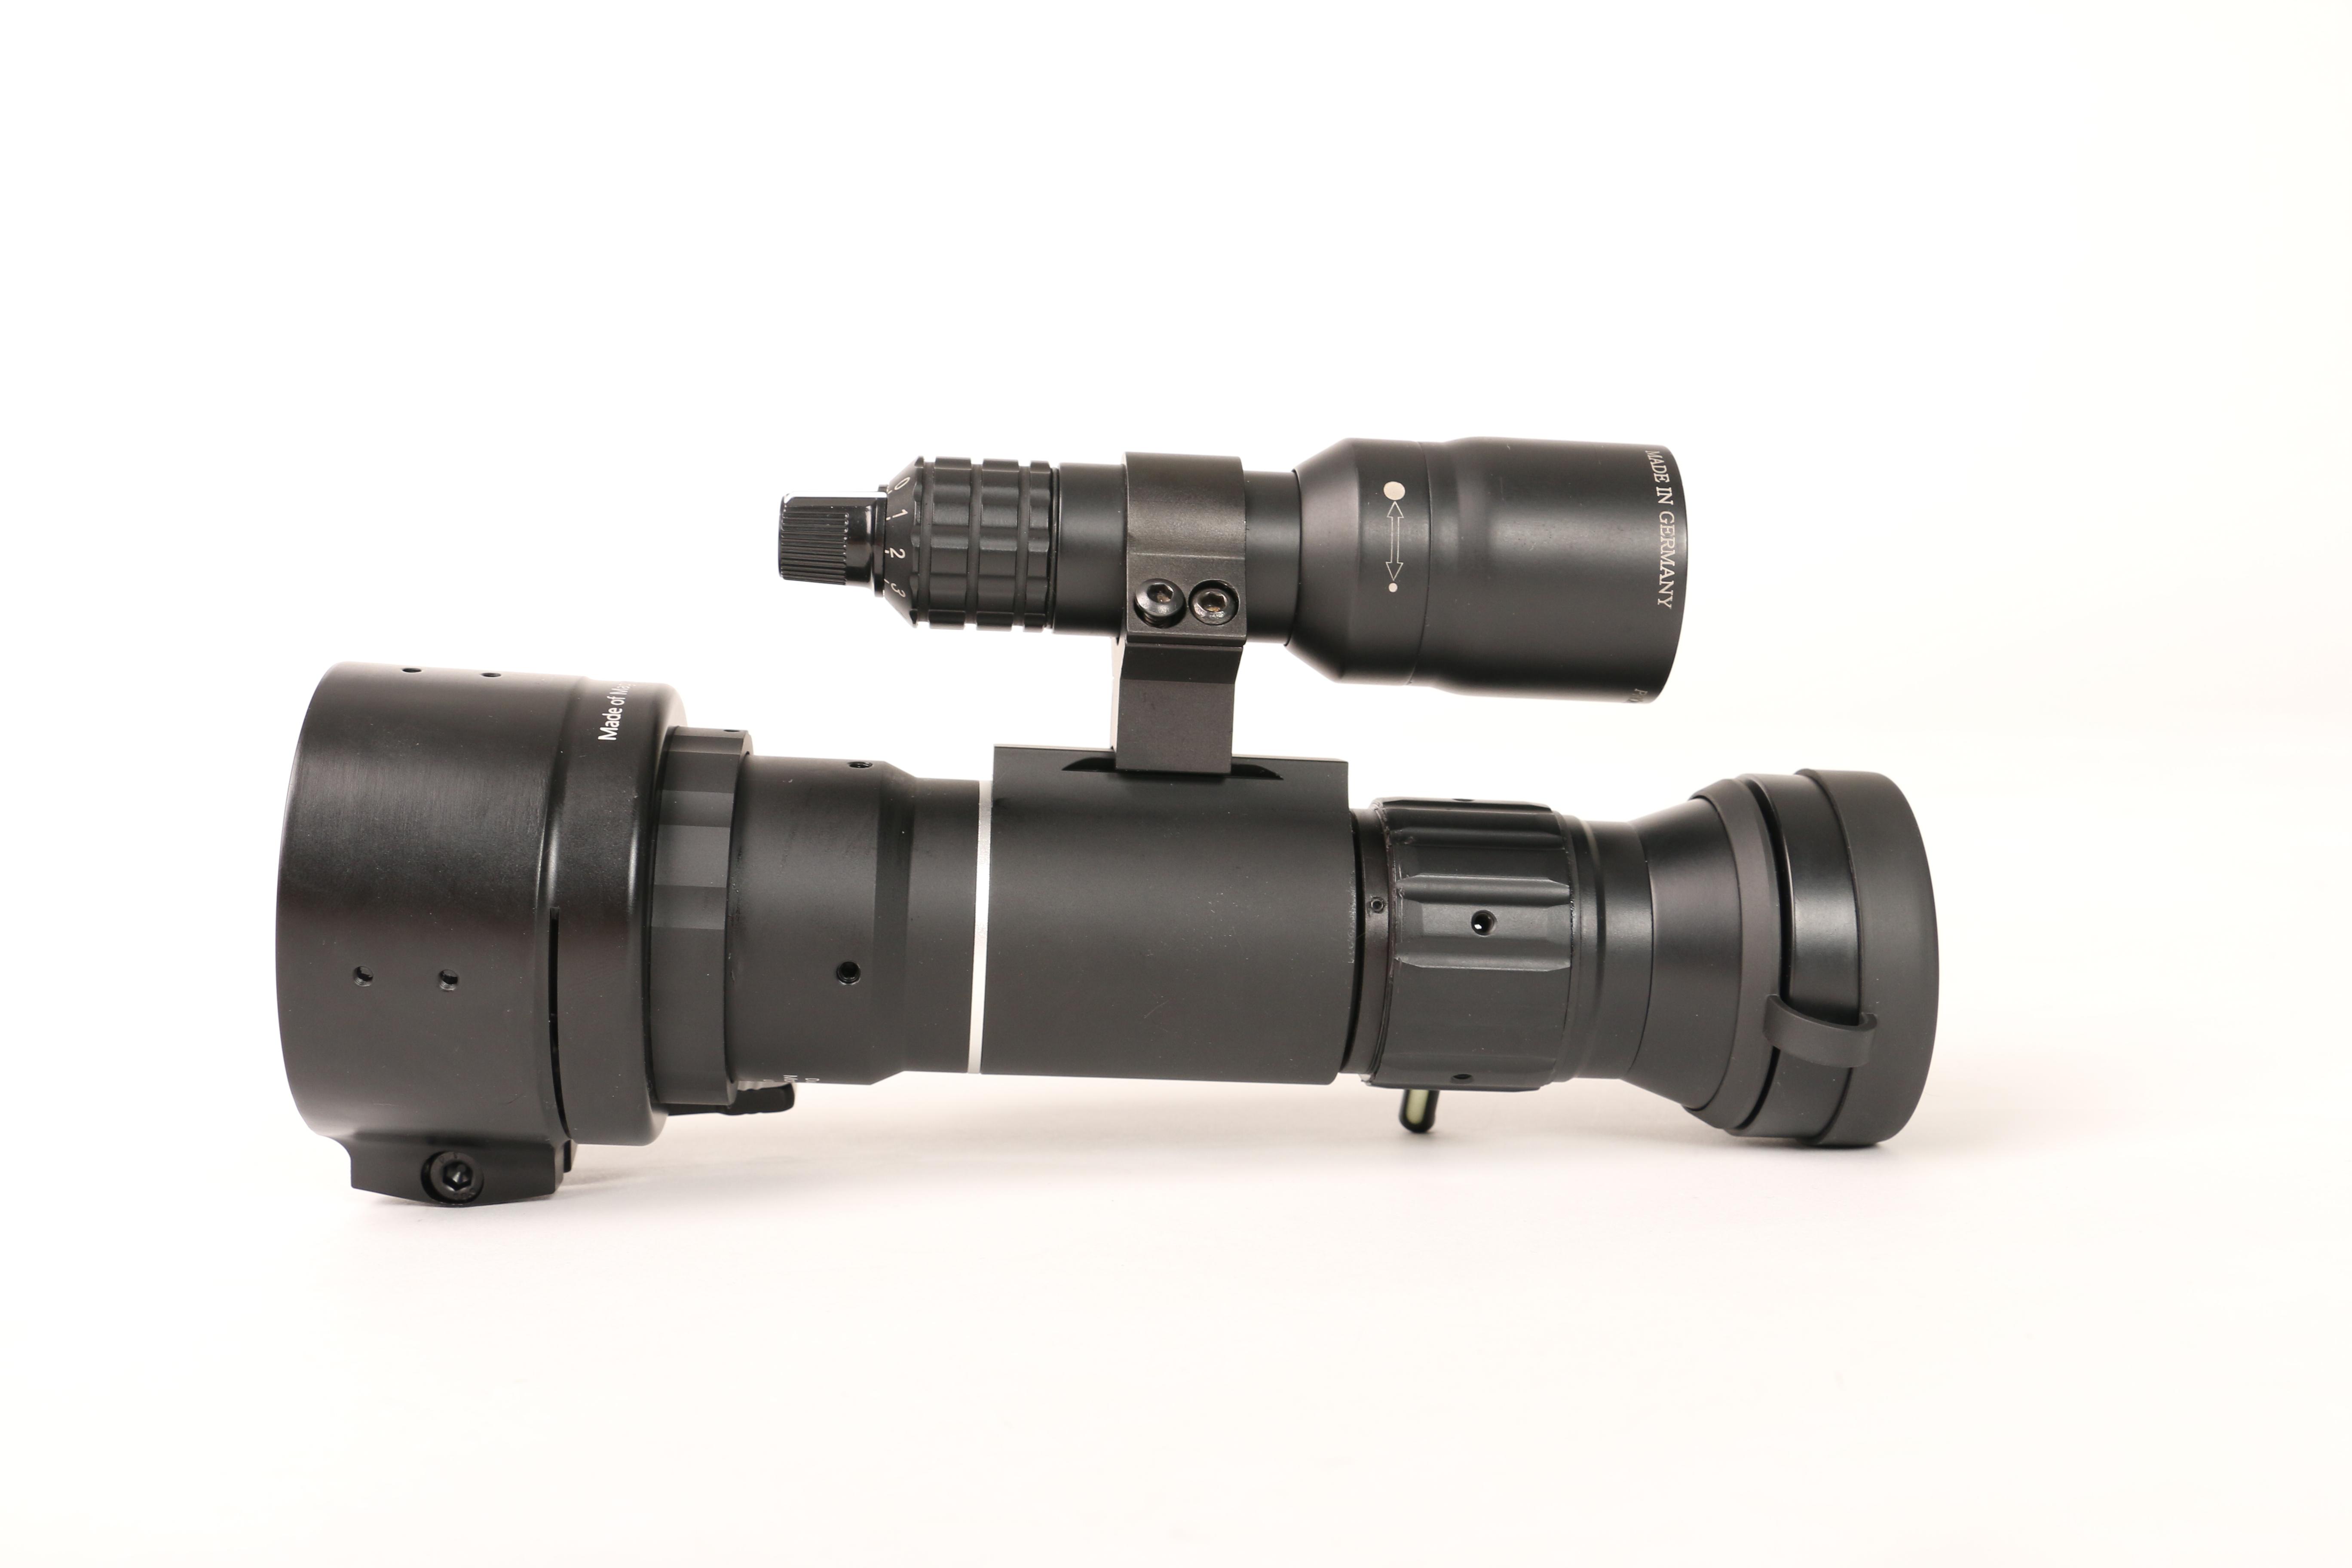 Monokulares nachtsichtgerät von hubertia jagd nyx ultimate hunting